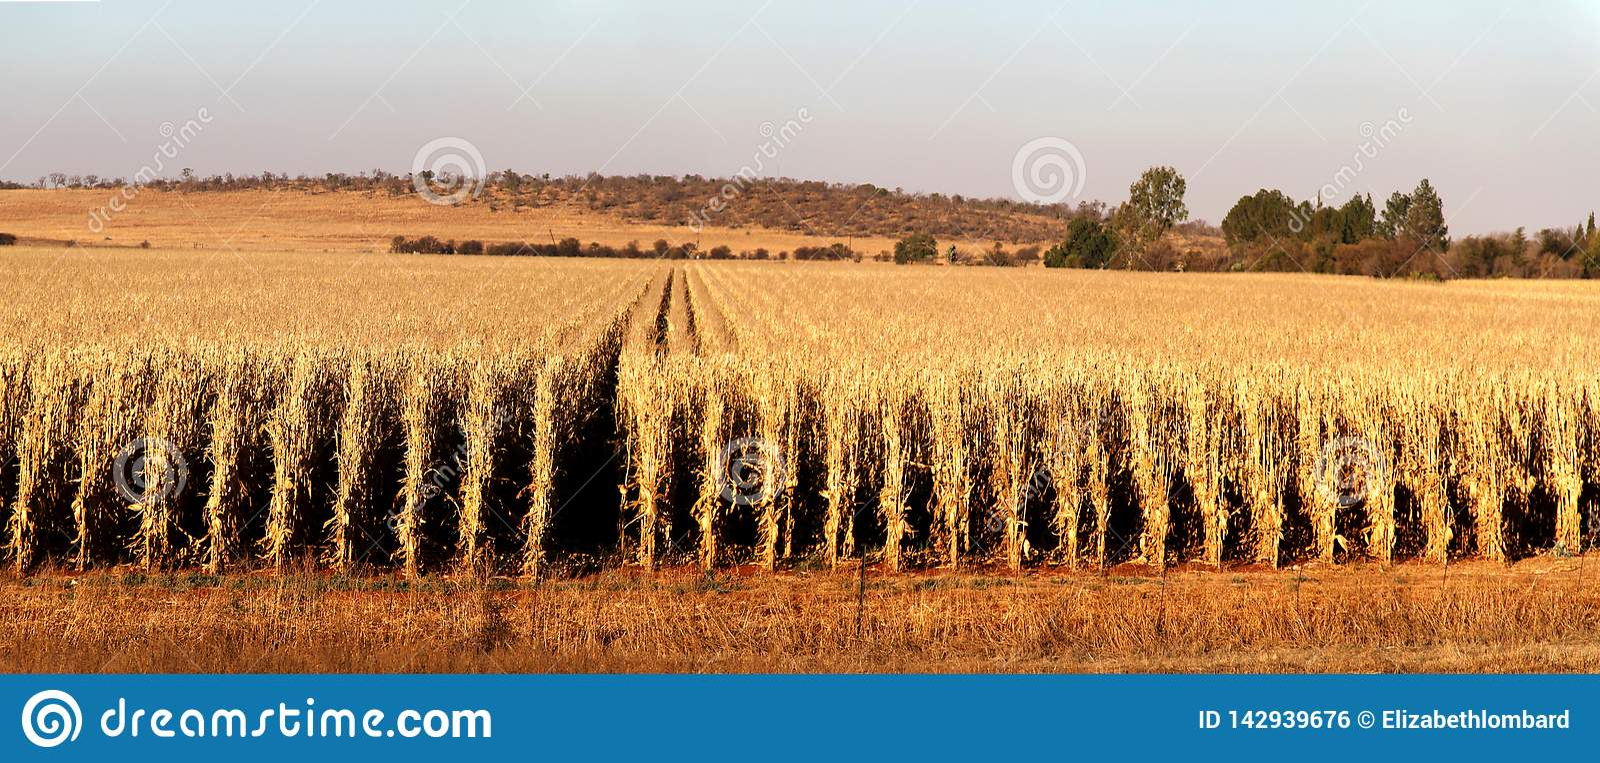 Azienda agricola a Potchefstroom, Sudafrica